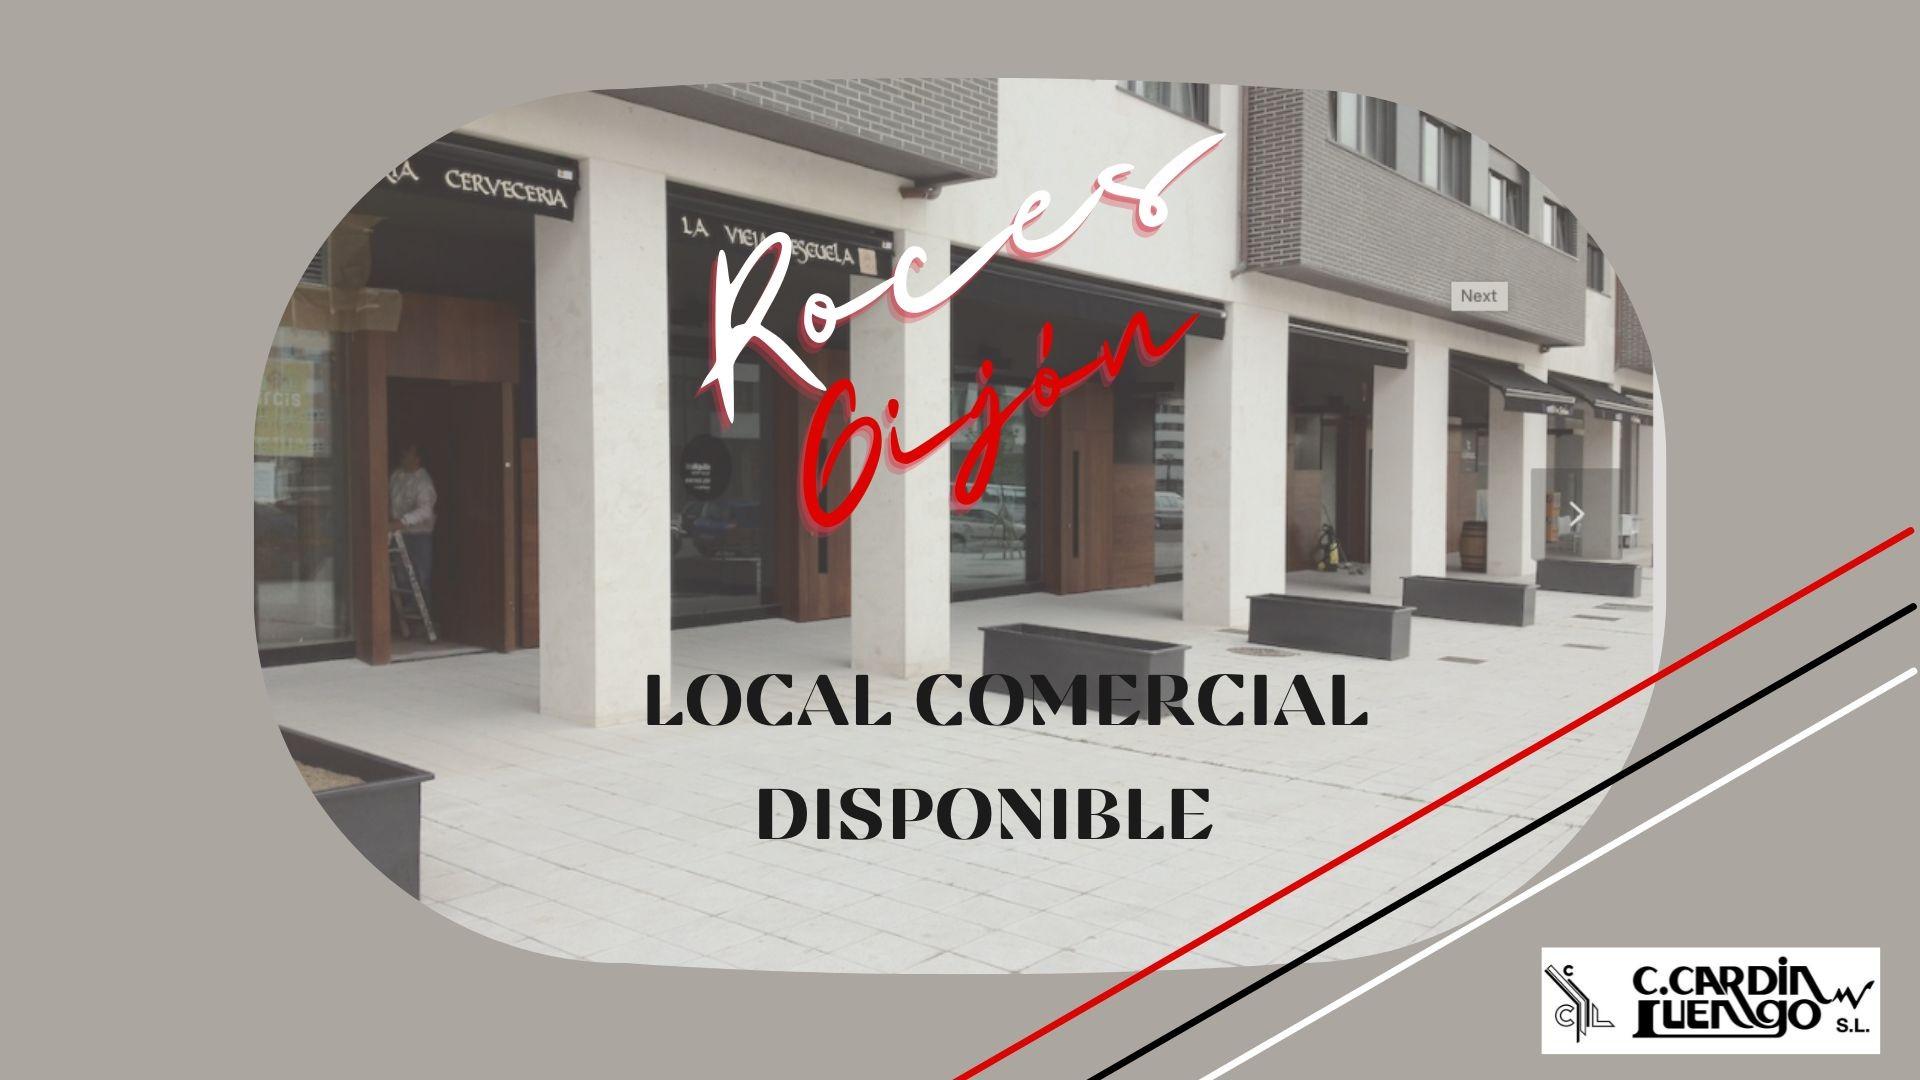 LOCAL ALQUILER ROCES GIJON IBERICA DE C Y A